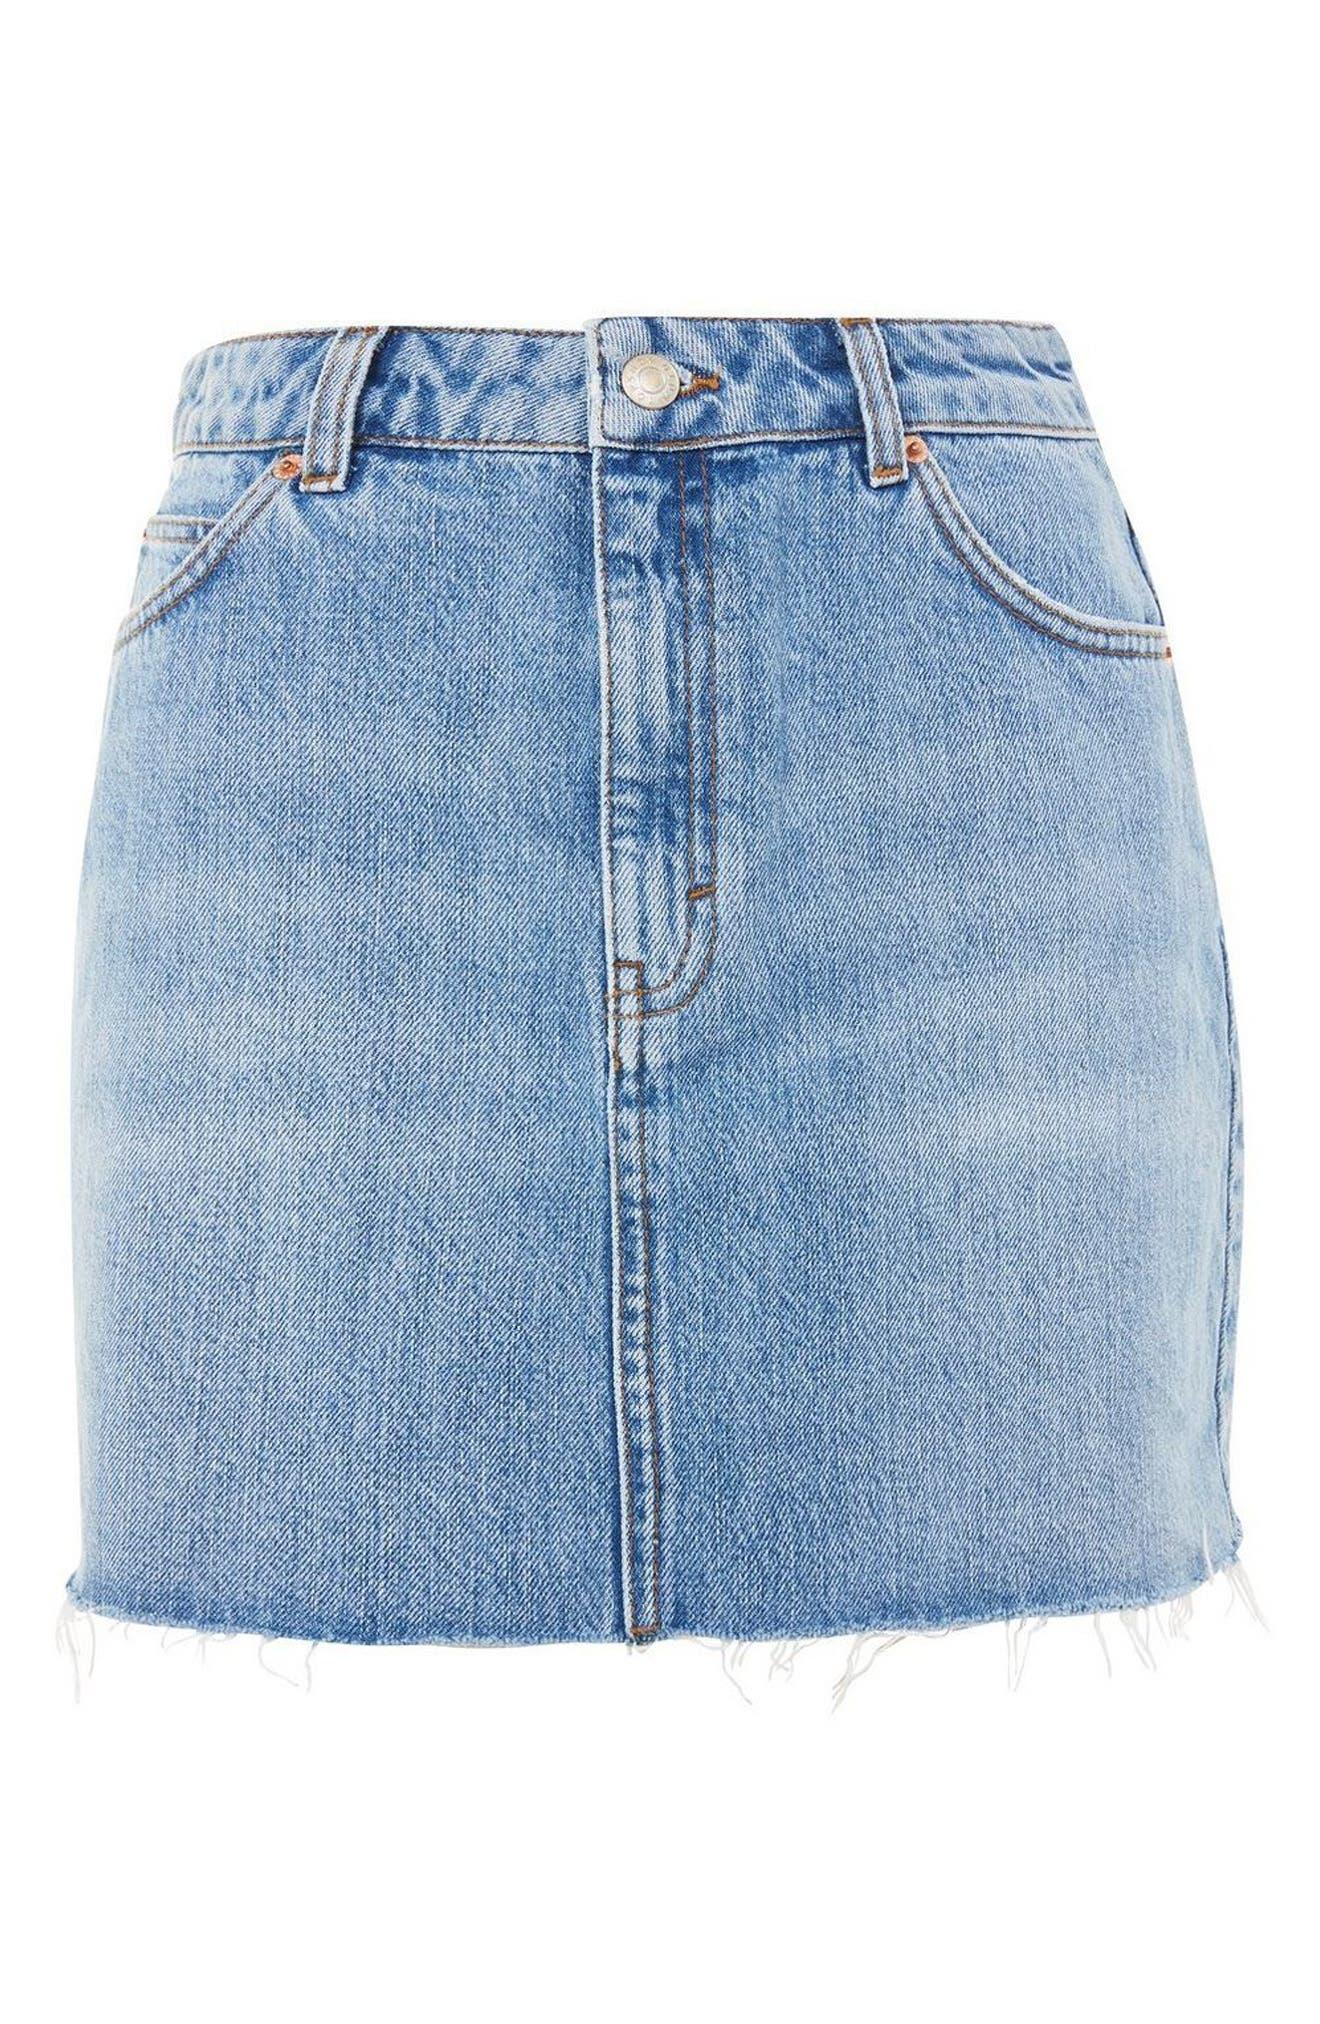 TOPSHOP, Denim Miniskirt, Alternate thumbnail 7, color, MID DENIM